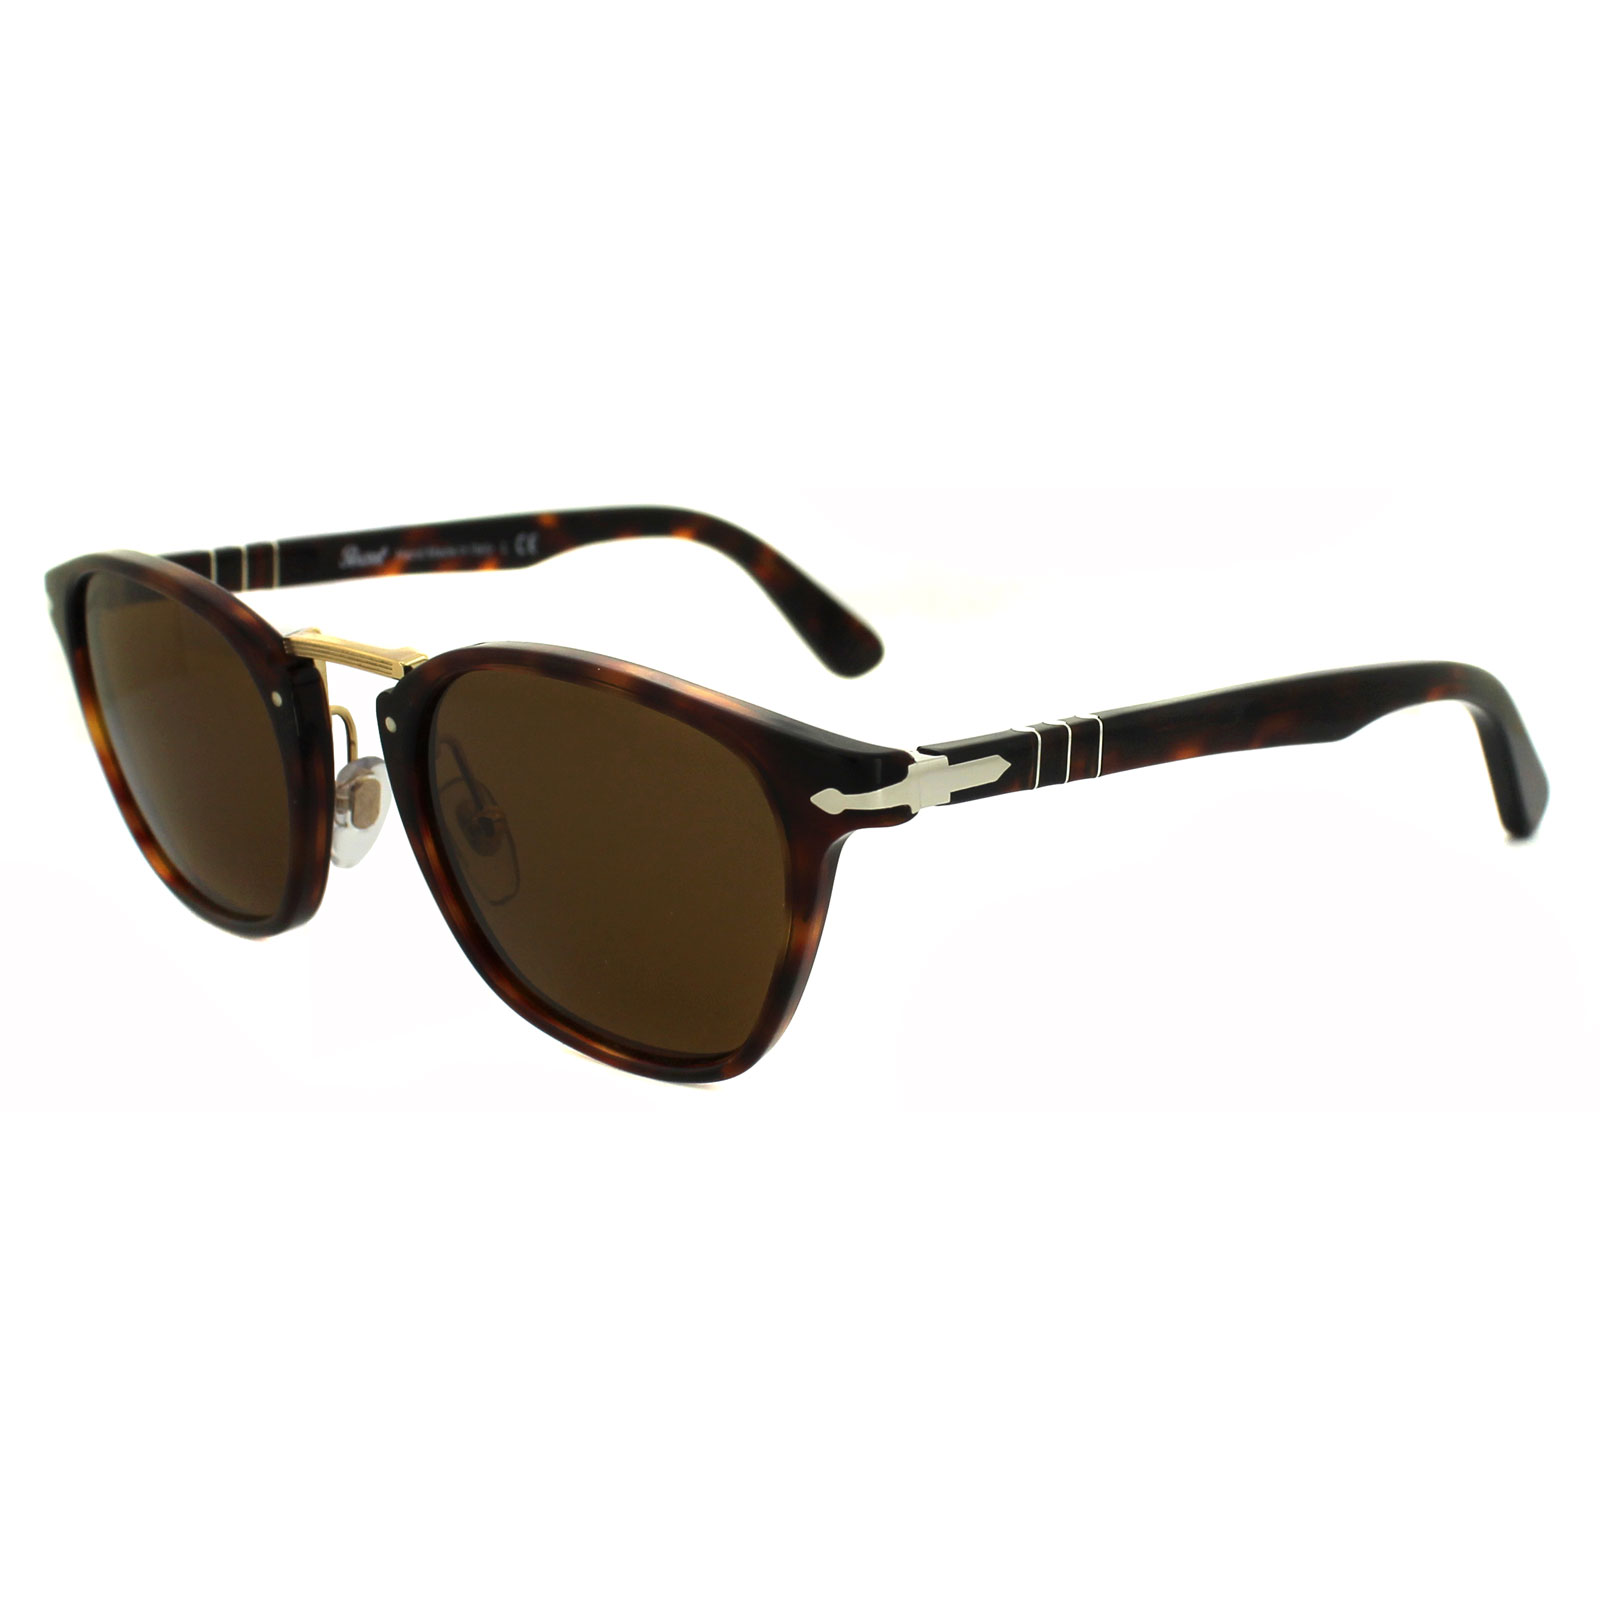 0a195f70979b Persol Sunglasses 3110 24/33 Havana Brown 8053672358445   eBay